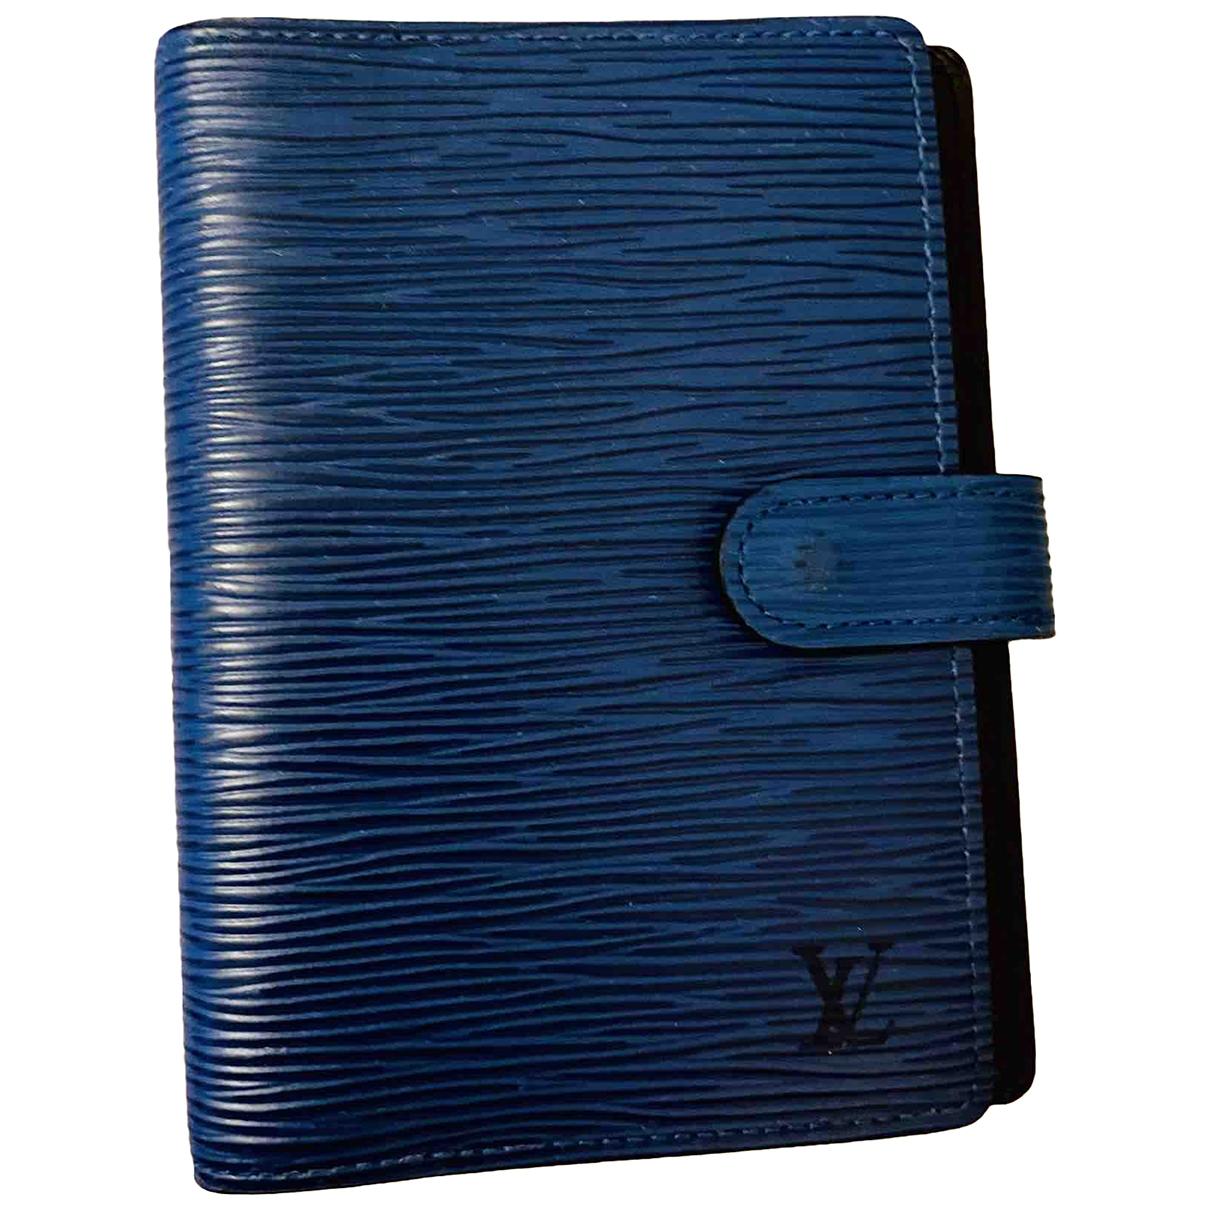 Agenda Couverture dagenda PM de Cuero Louis Vuitton